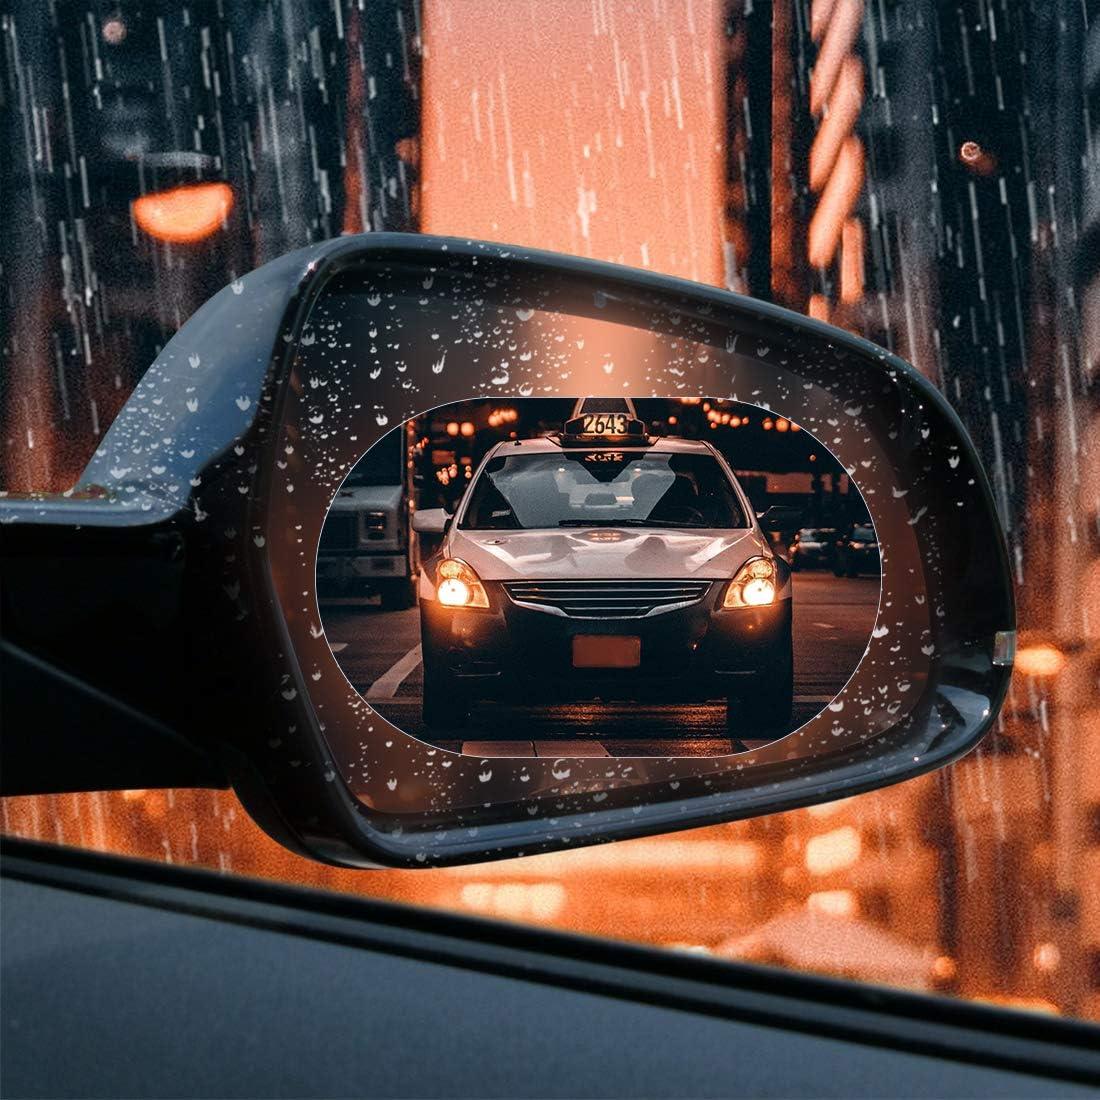 X AUTOHAUX 2pcs 130 x 95mm Oval Car Rearview Mirror Anti Rain Anti-Glare Film Clear Protective Sticker